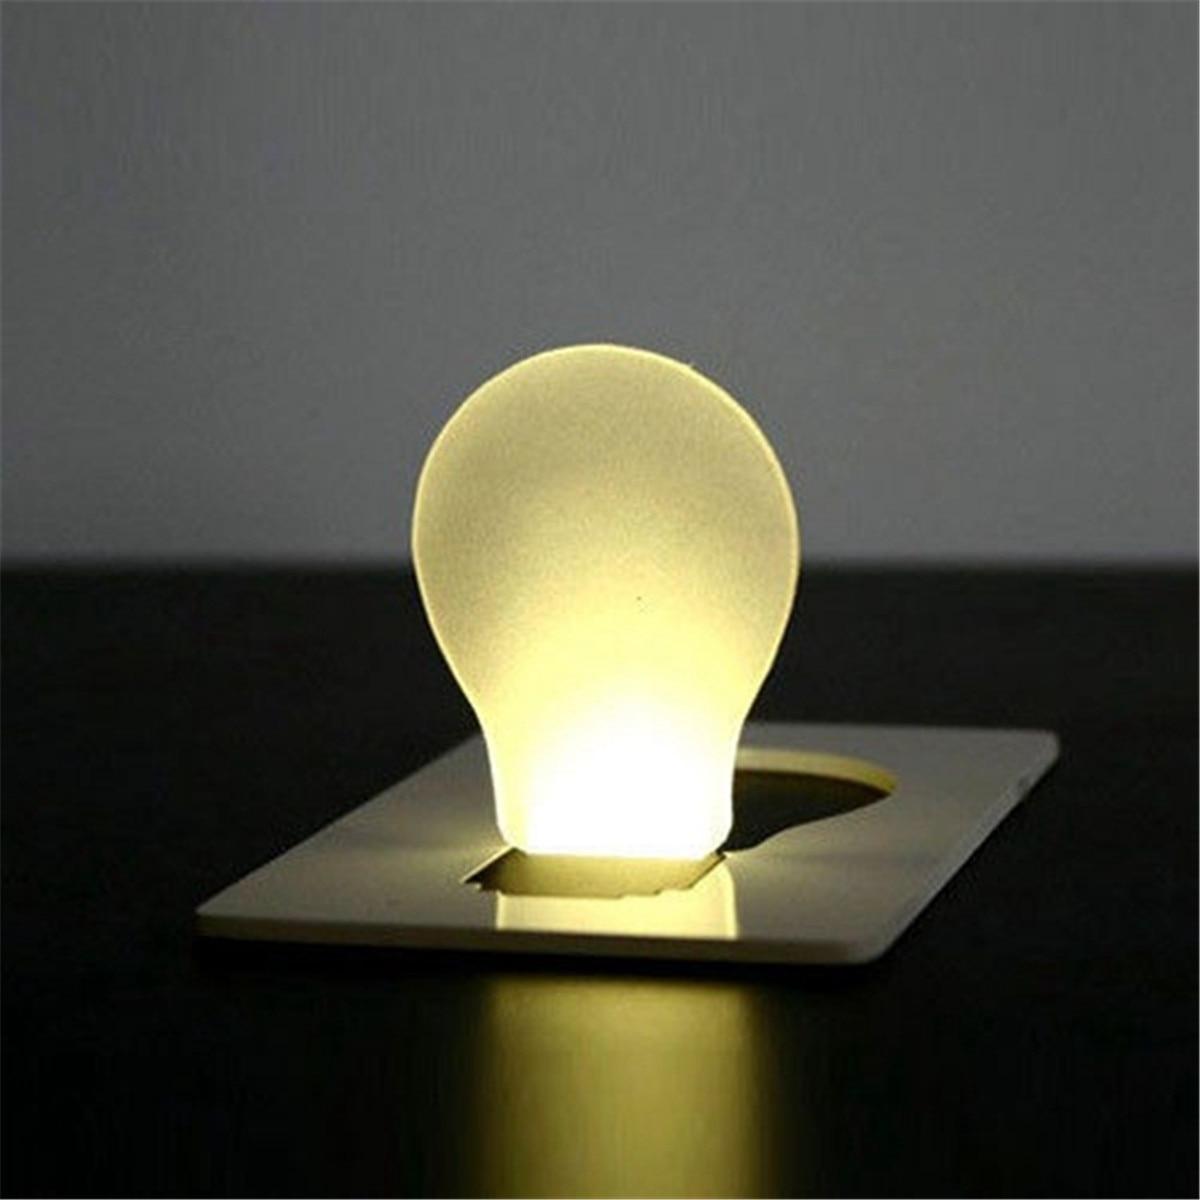 Smuxi Mini Wallet For Pocket Credit Card Size Portable LED Night Light Lamp Bulbs Cute Paper Card Flashlight